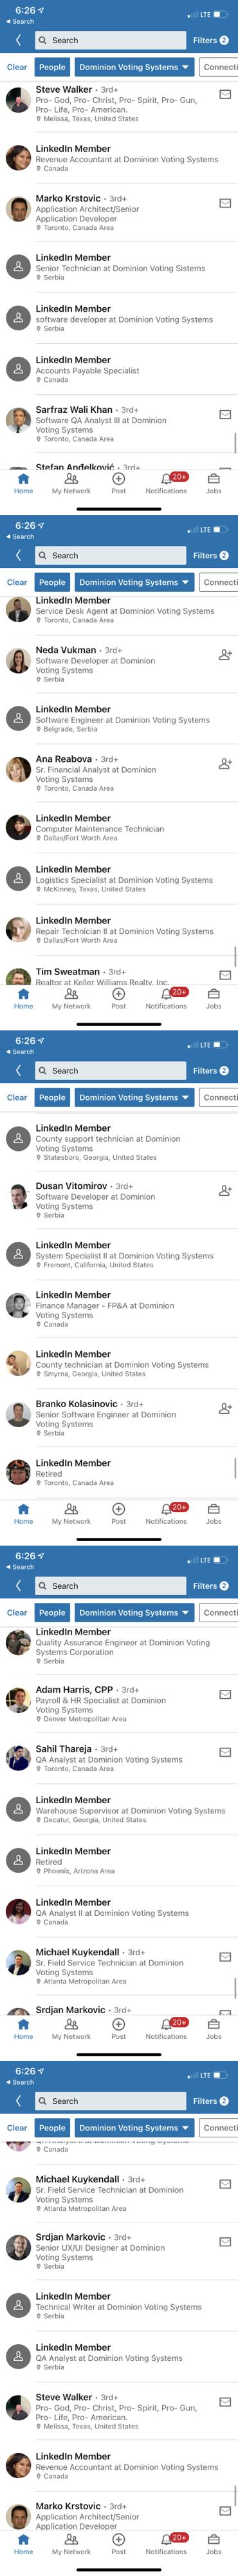 Dominion Employees LinkedIn 1